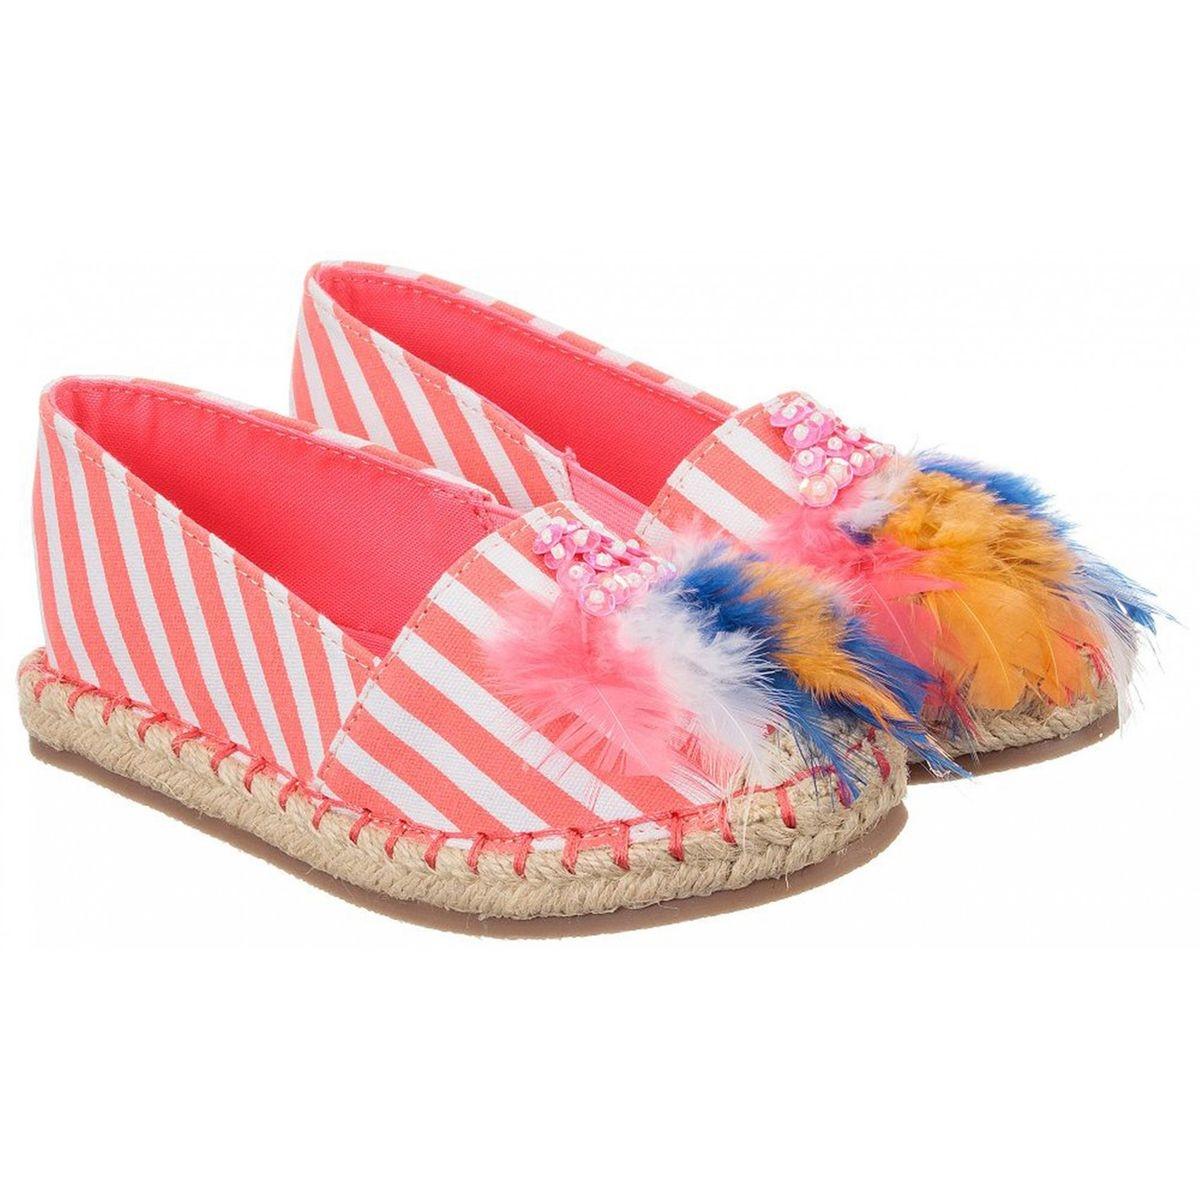 Chaussures espadrilles rayé